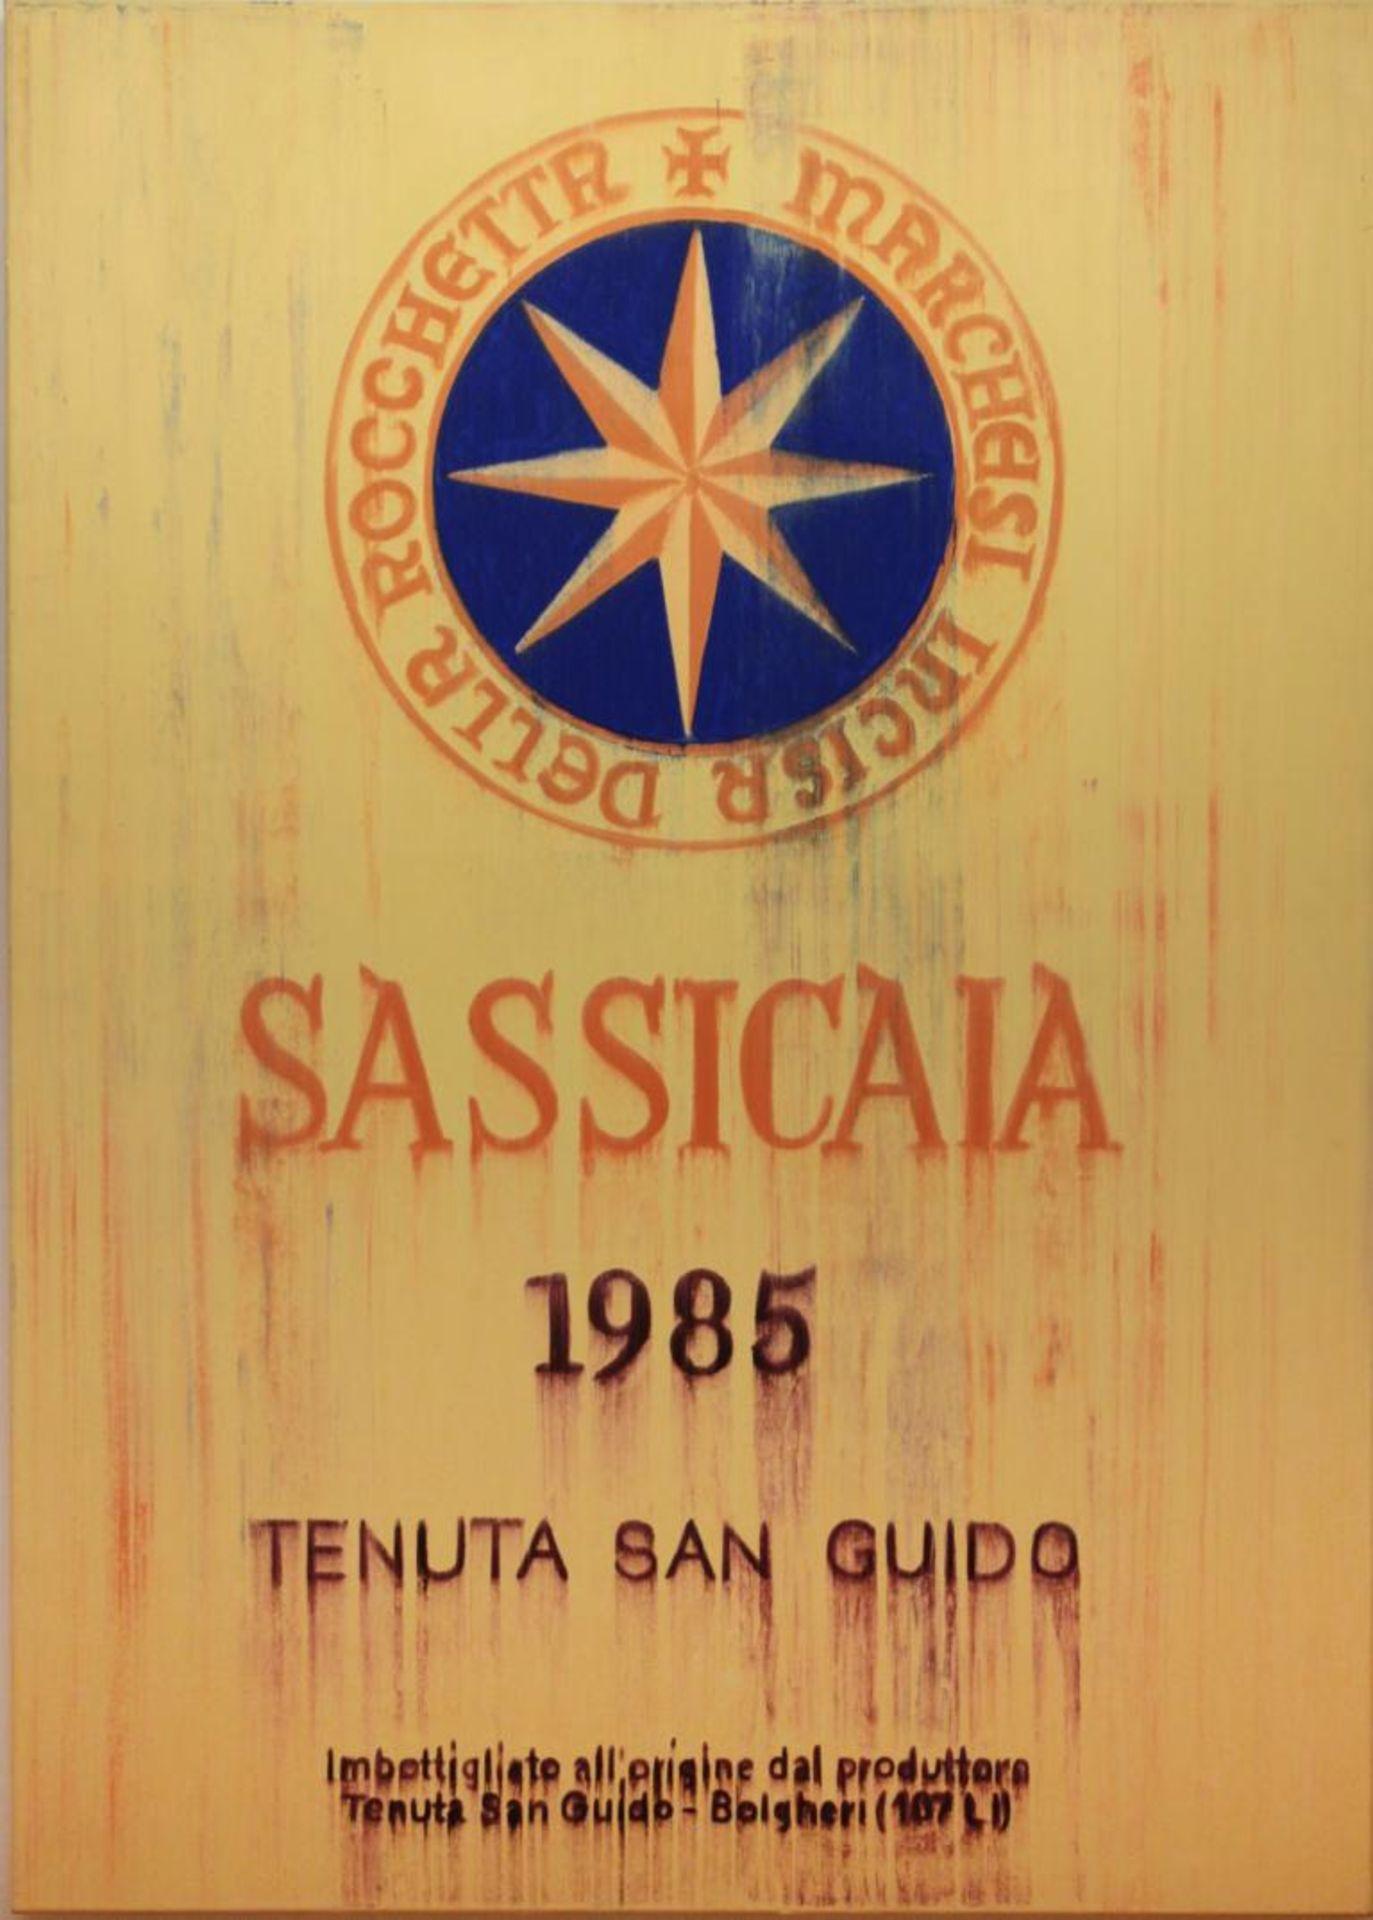 Los 59 - Borrower Djawid (geb. 1958) Weinbild (Sassicaia) Öl auf Leinwand handsigniert rückseitig 124,5 x